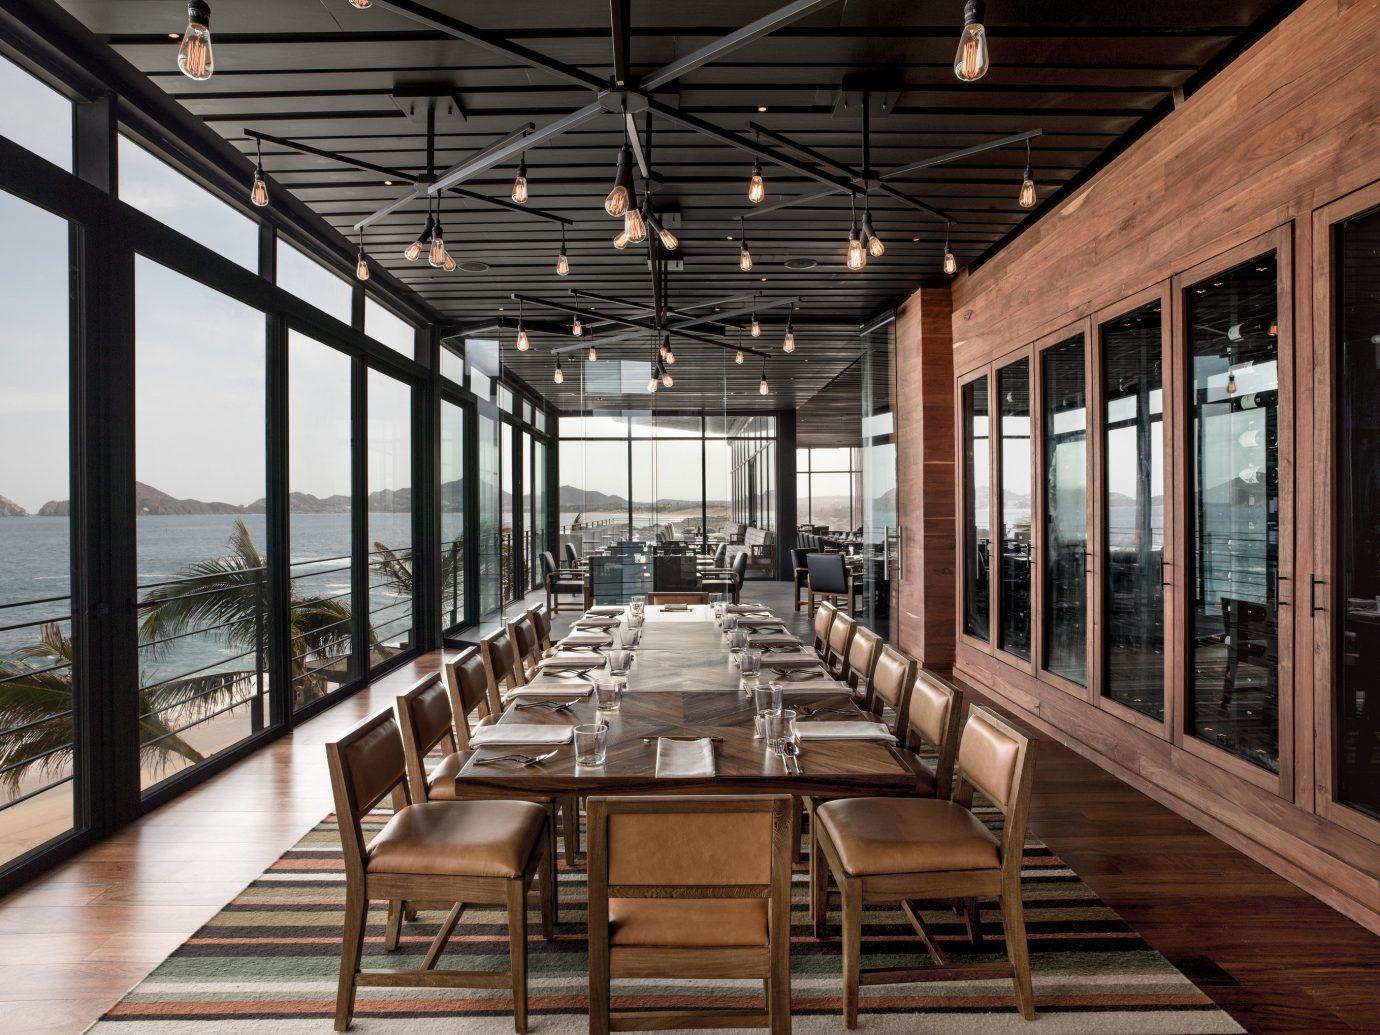 Travel Tips room estate Architecture wood home interior design lighting Resort platform Lobby several